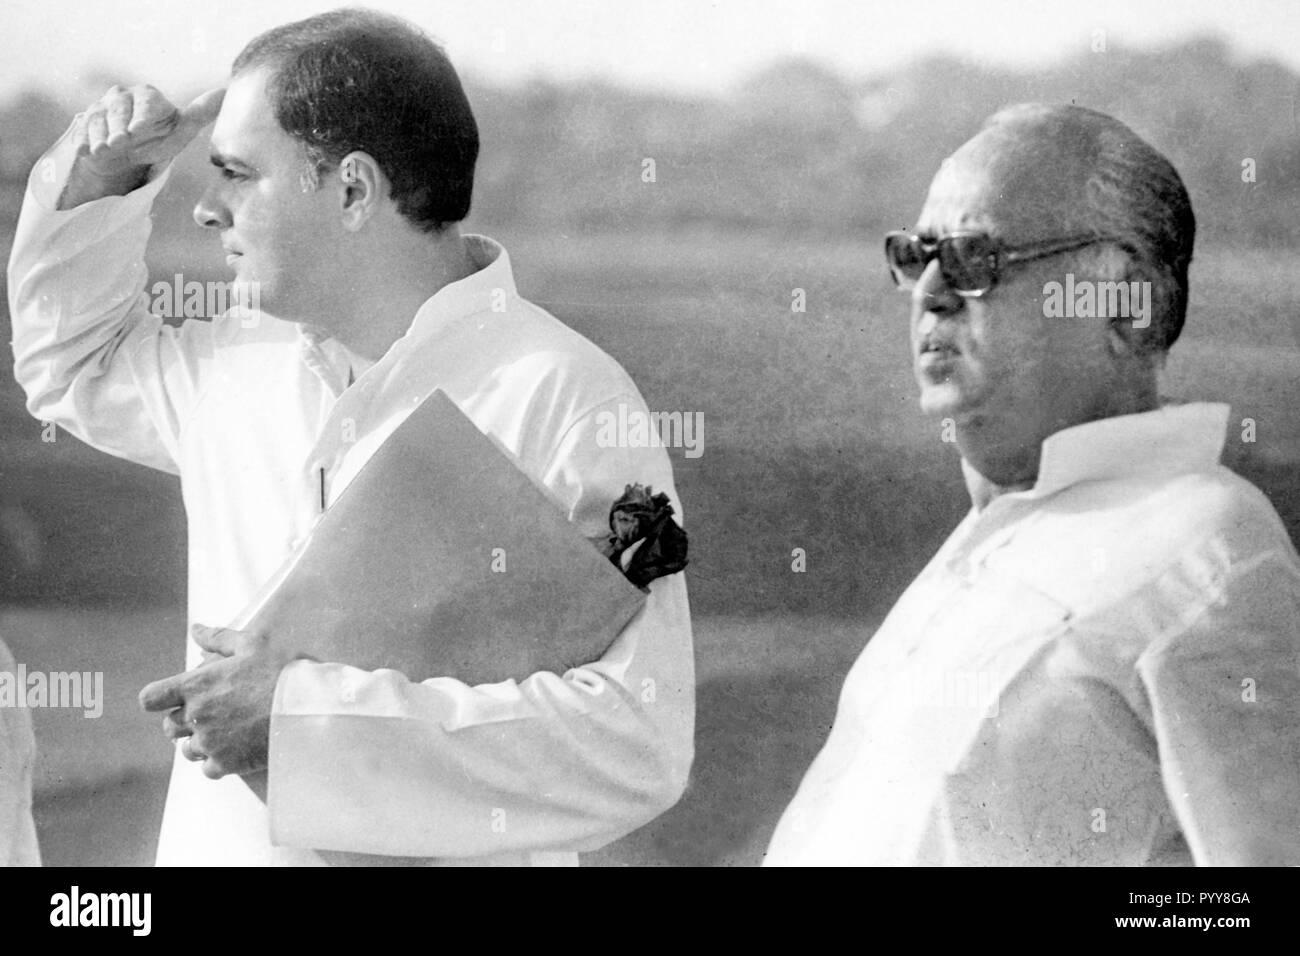 Rajiv Gandhi avec Vasantdada Patil, Mumbai, Maharashtra, Inde, Asie, 1985 Photo Stock